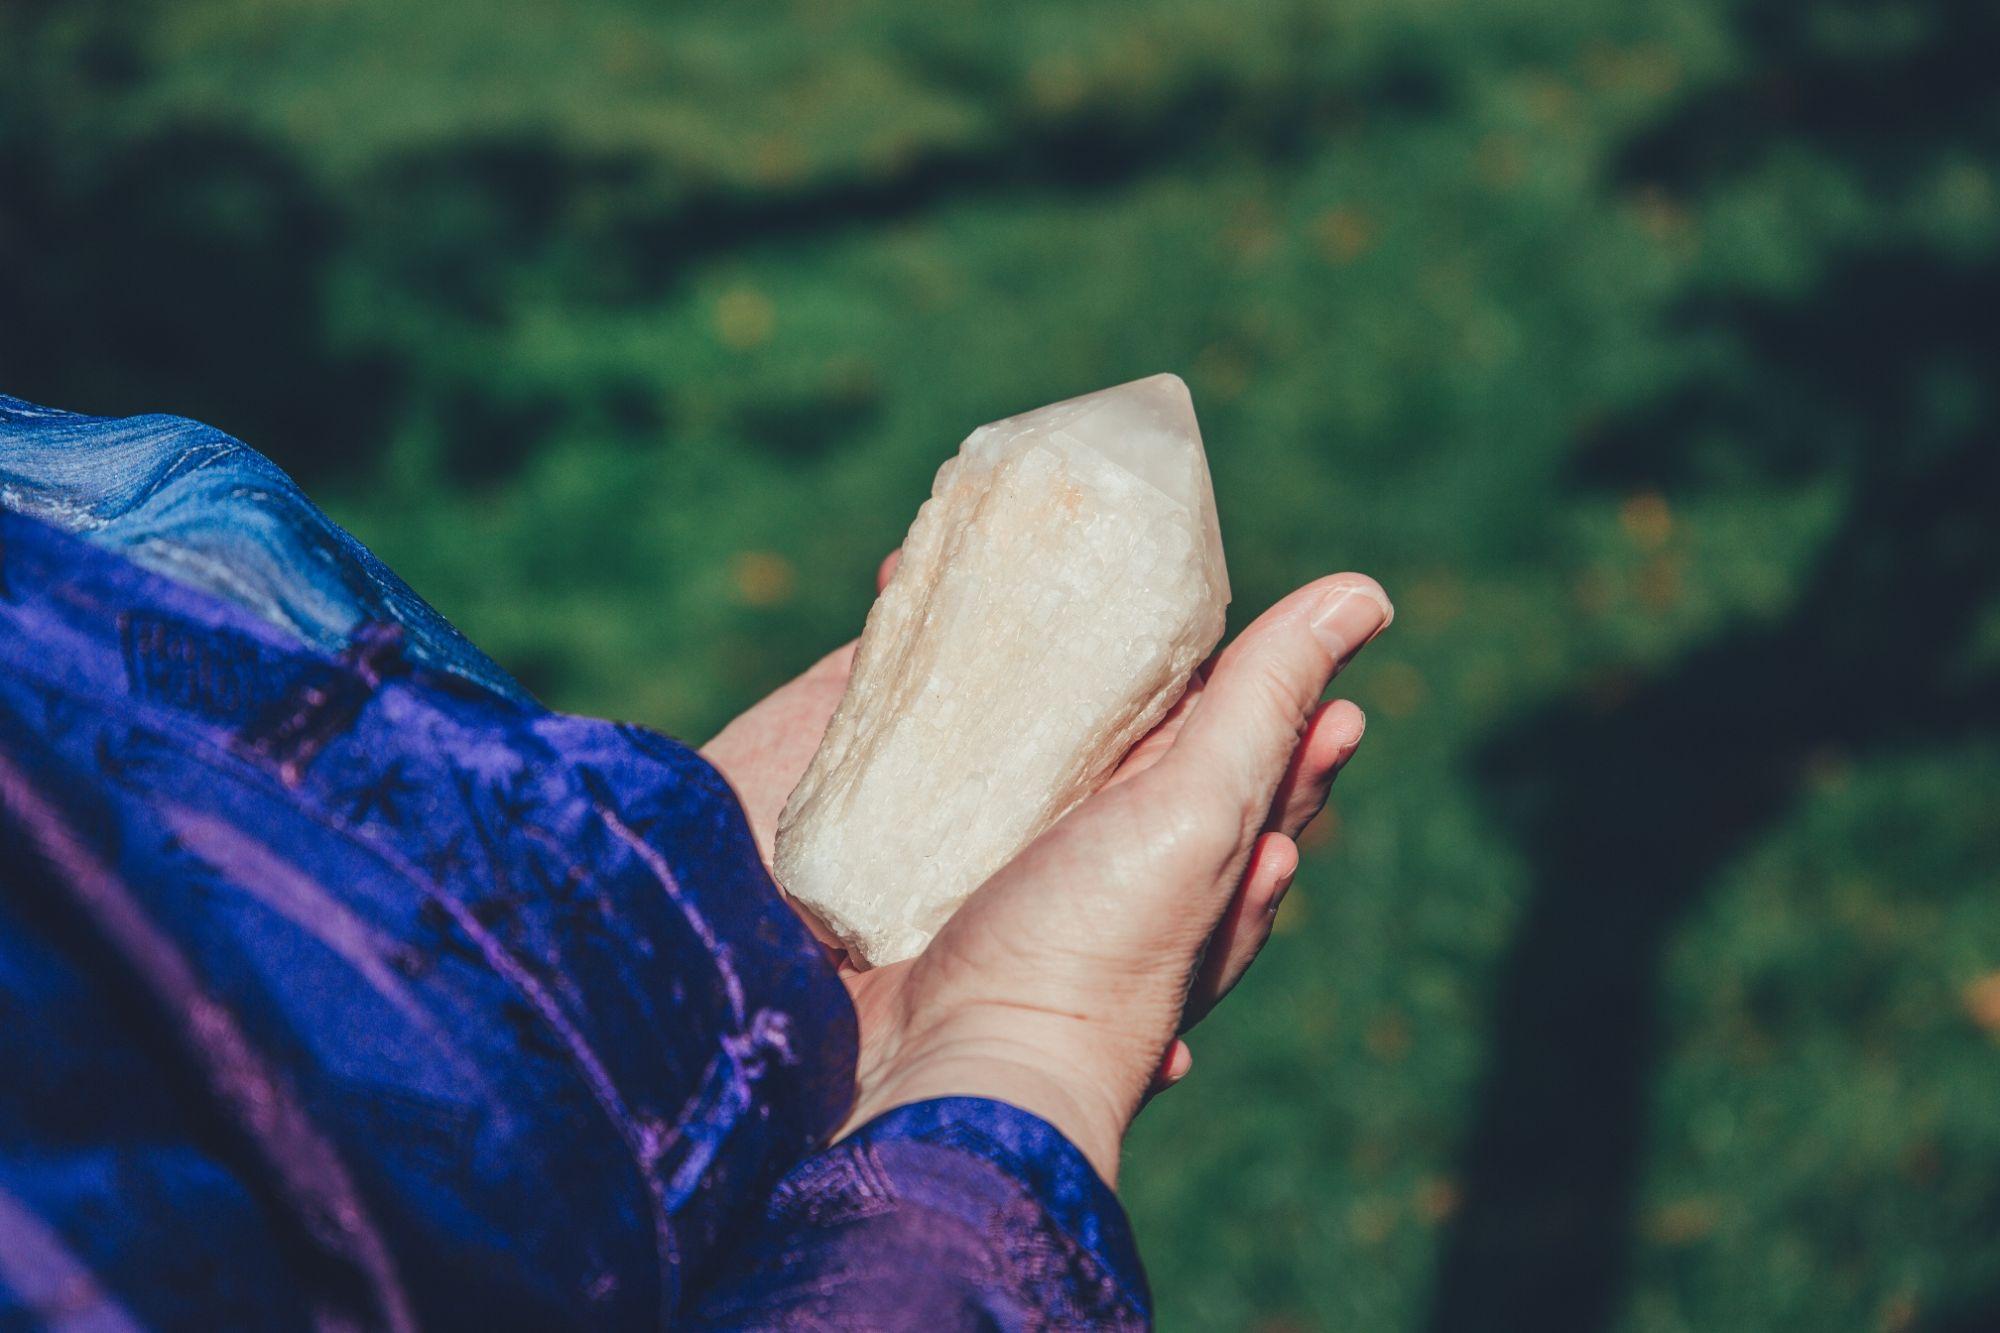 Helen's hands holding a candle quartz point